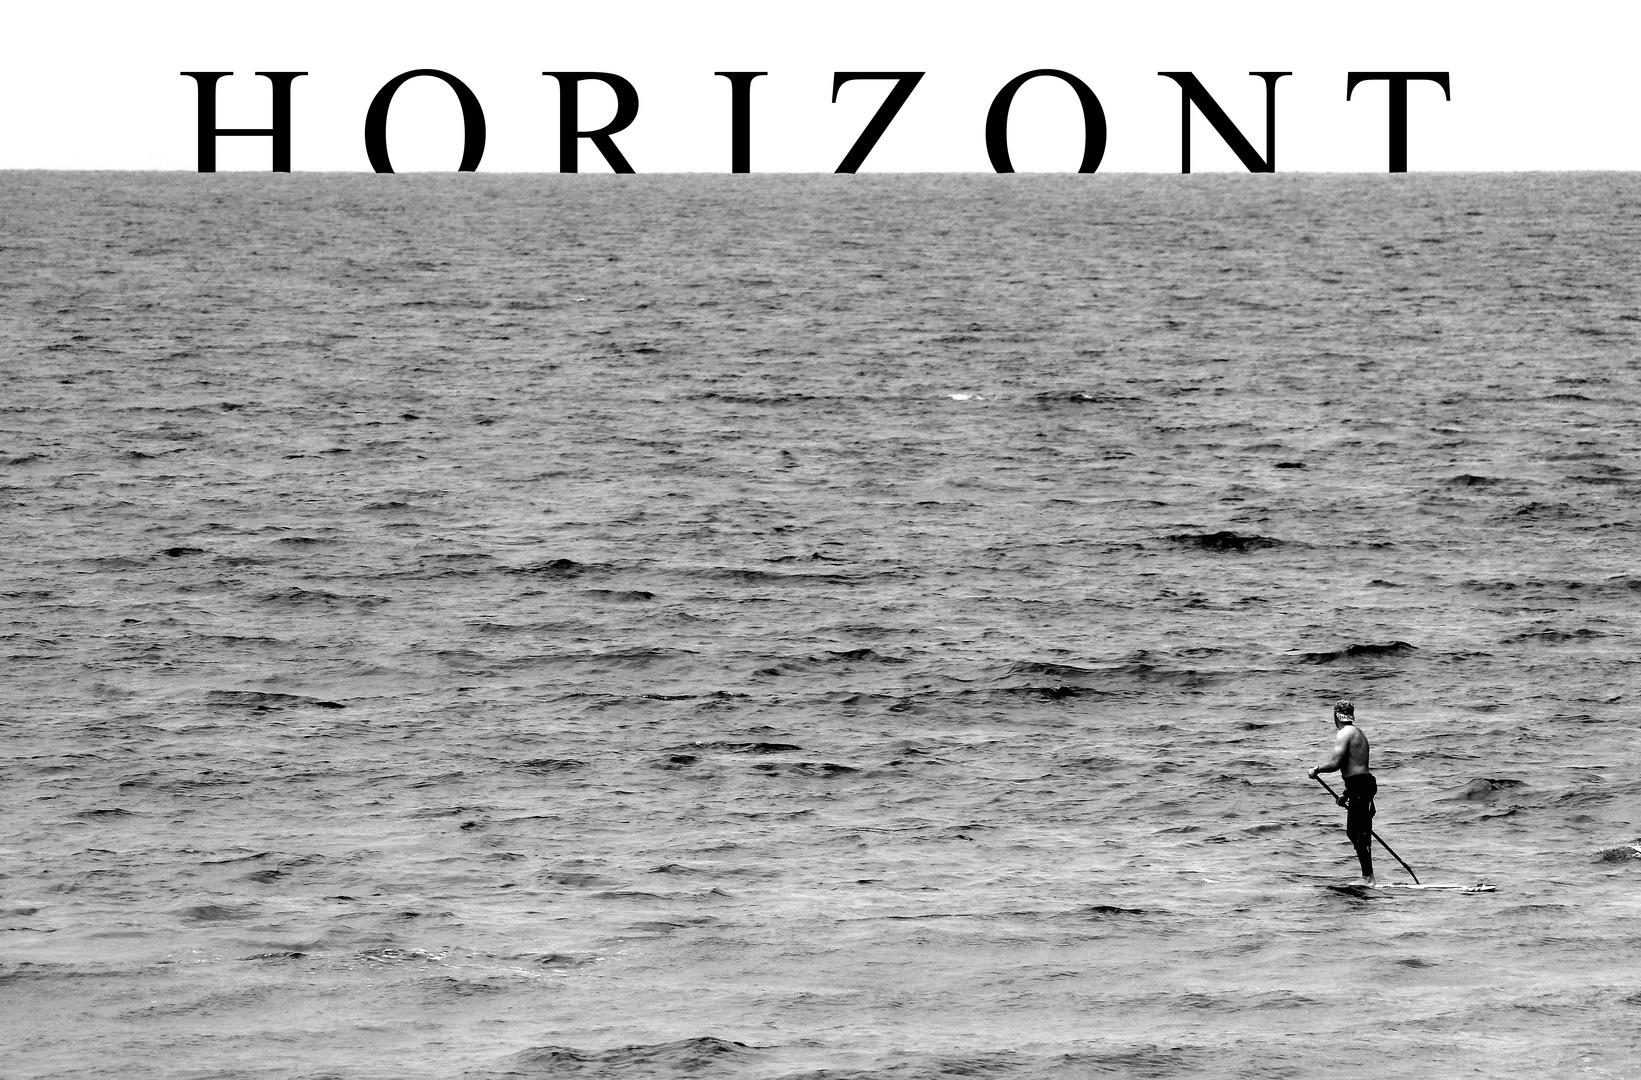 HORIZONT